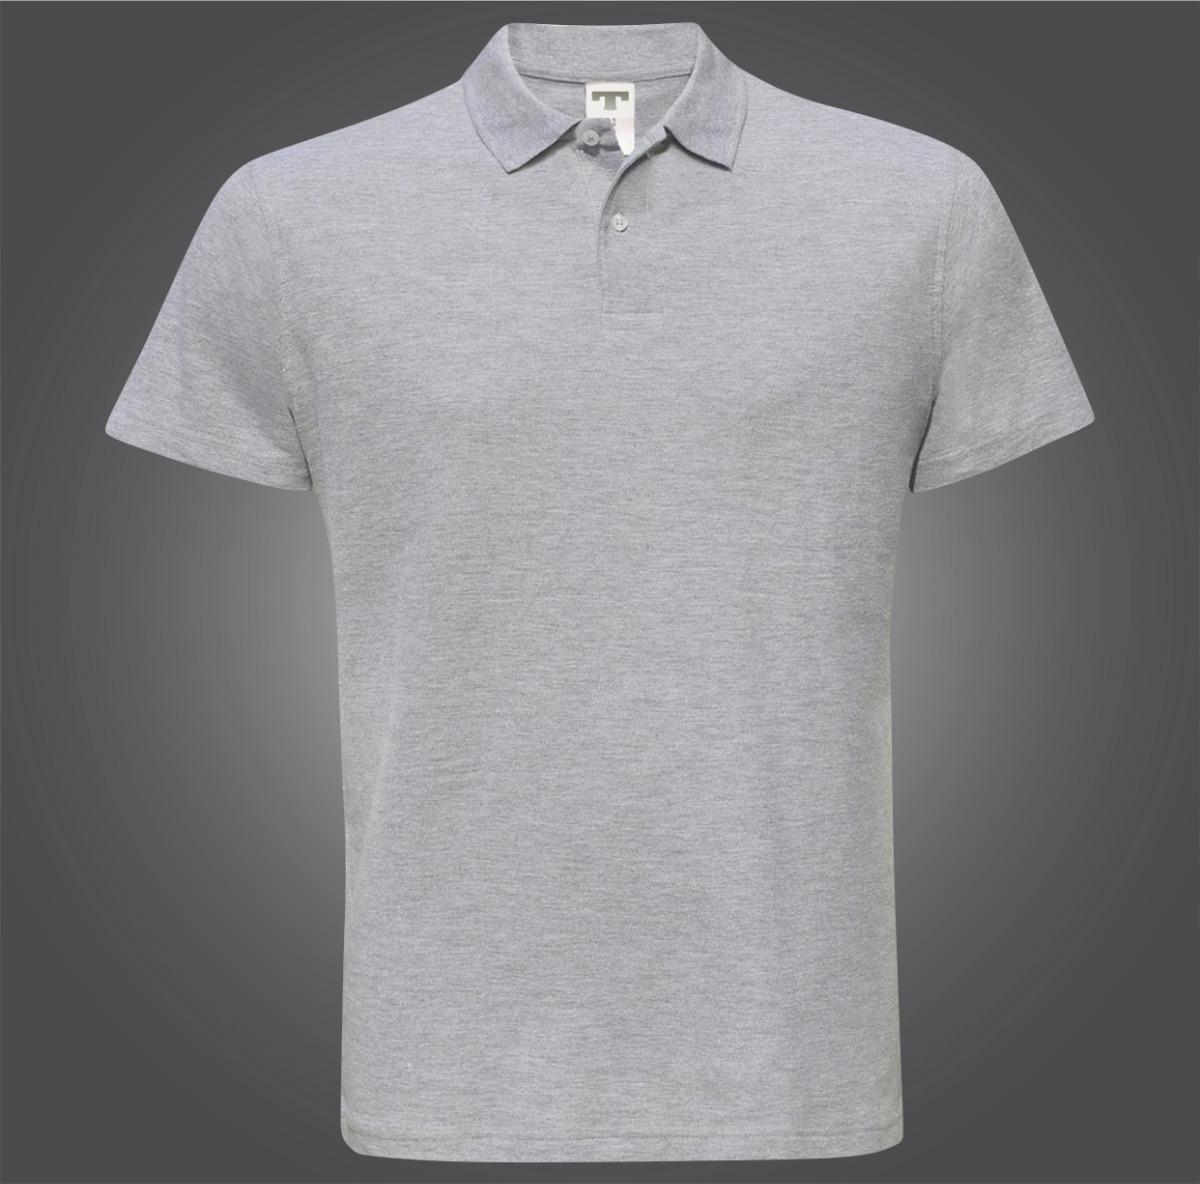 camisa polo camiseta polo lisa blusa gola polo. Carregando zoom. 1dff43359c6ba